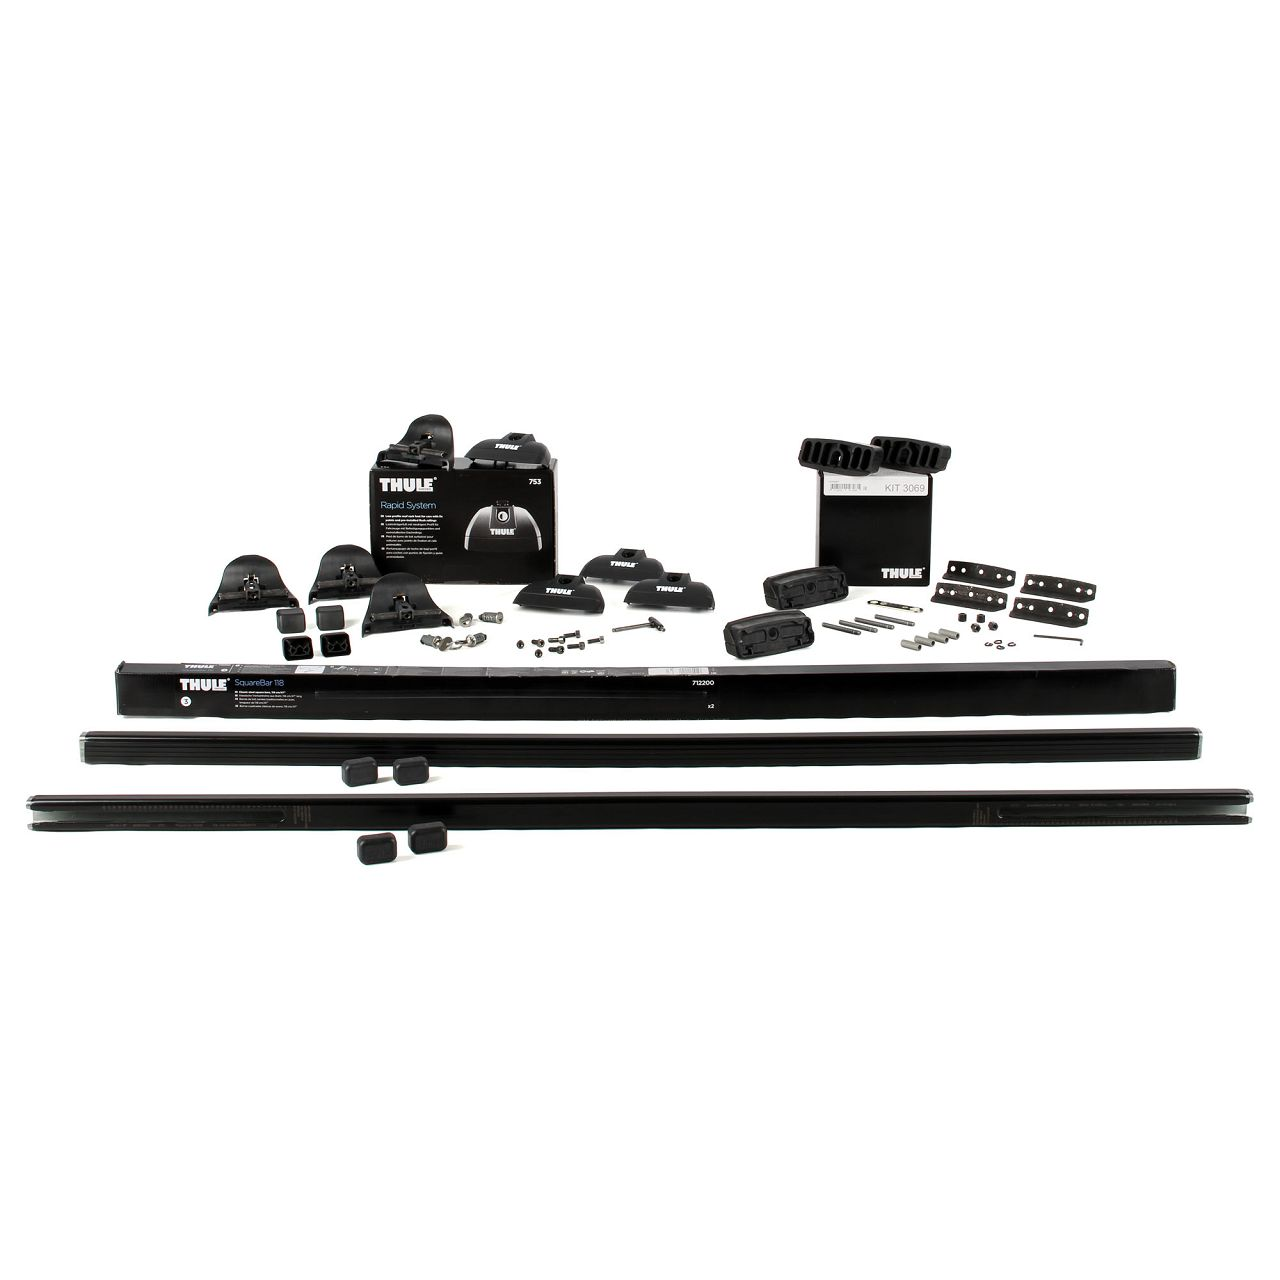 THULE Grundträger Dachträger + Fußsatz + Montagesatz 712 + 753 + 3069